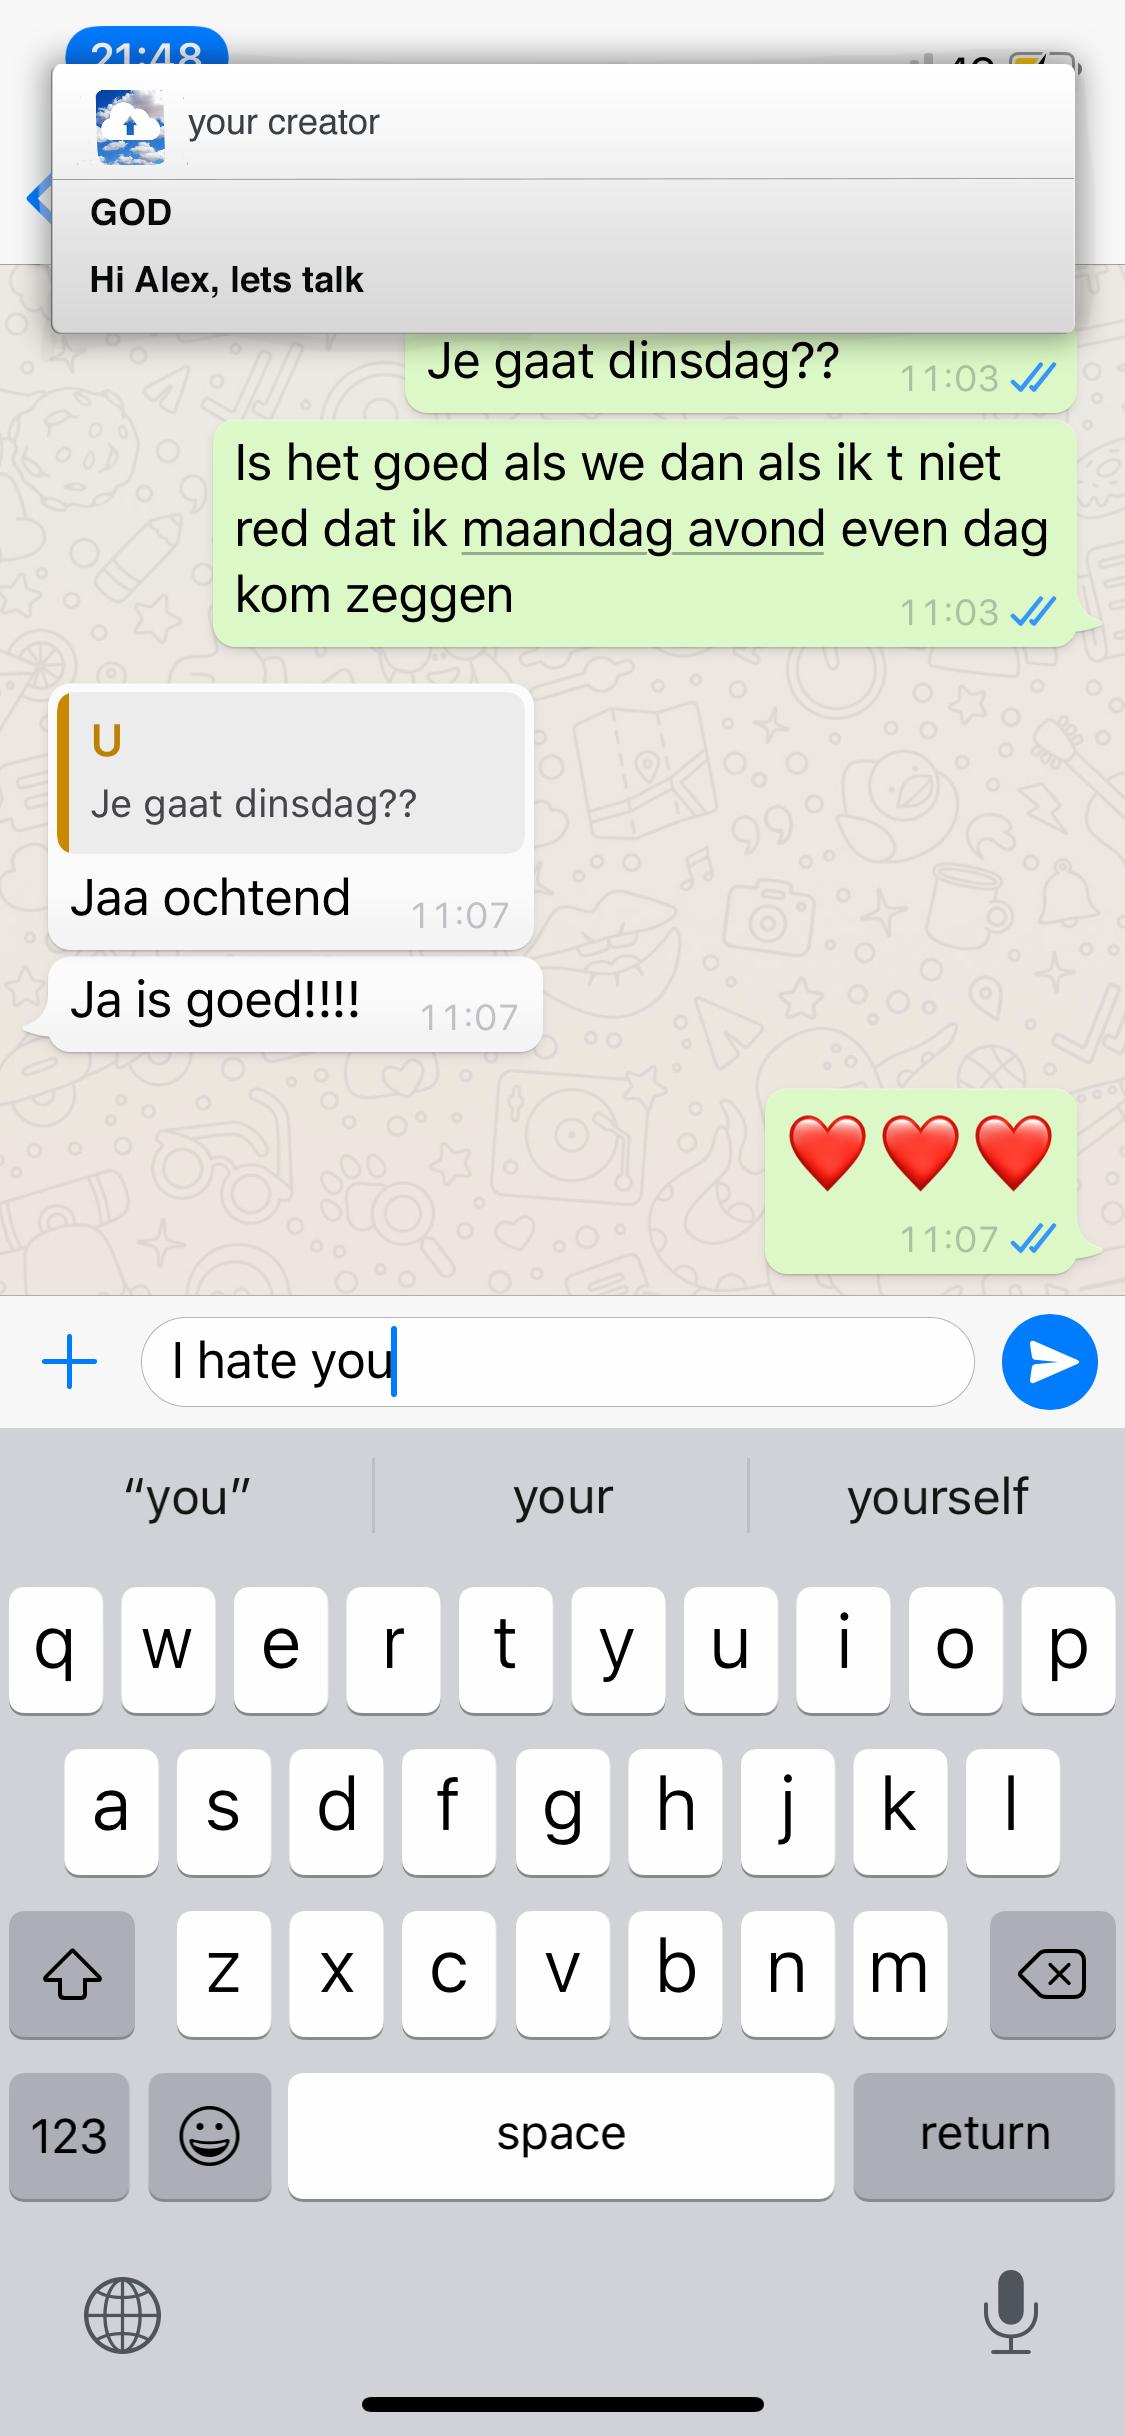 chat met god